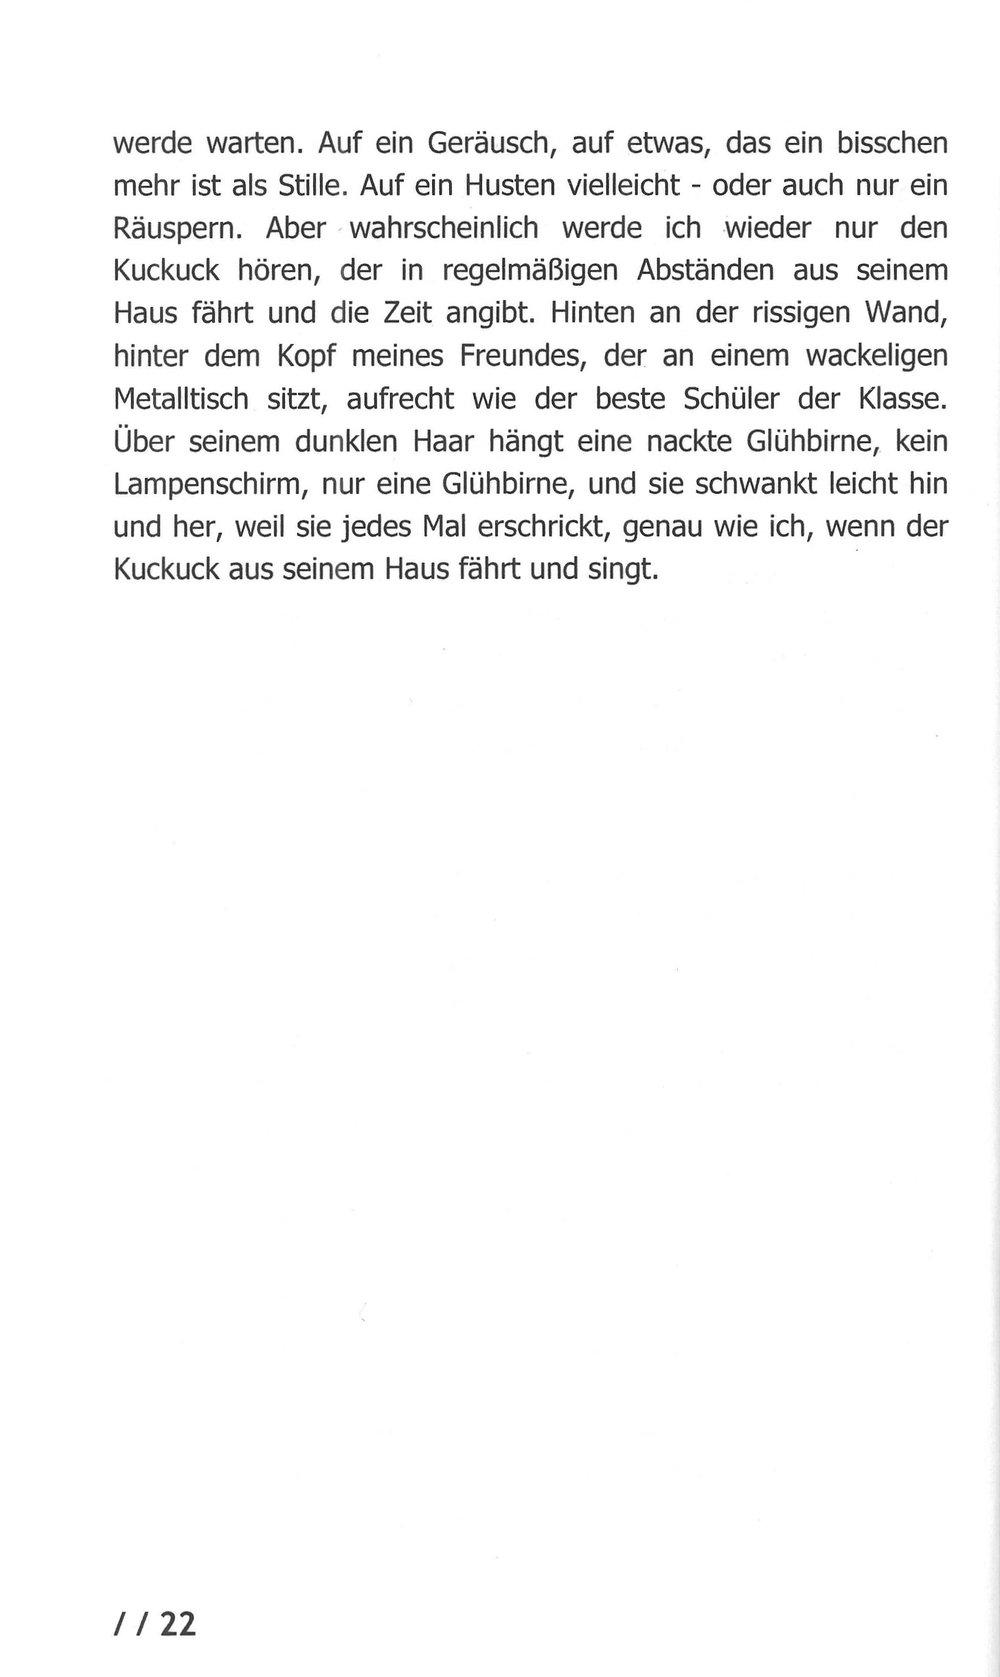 Sprachrausch_8:8_mini.jpg